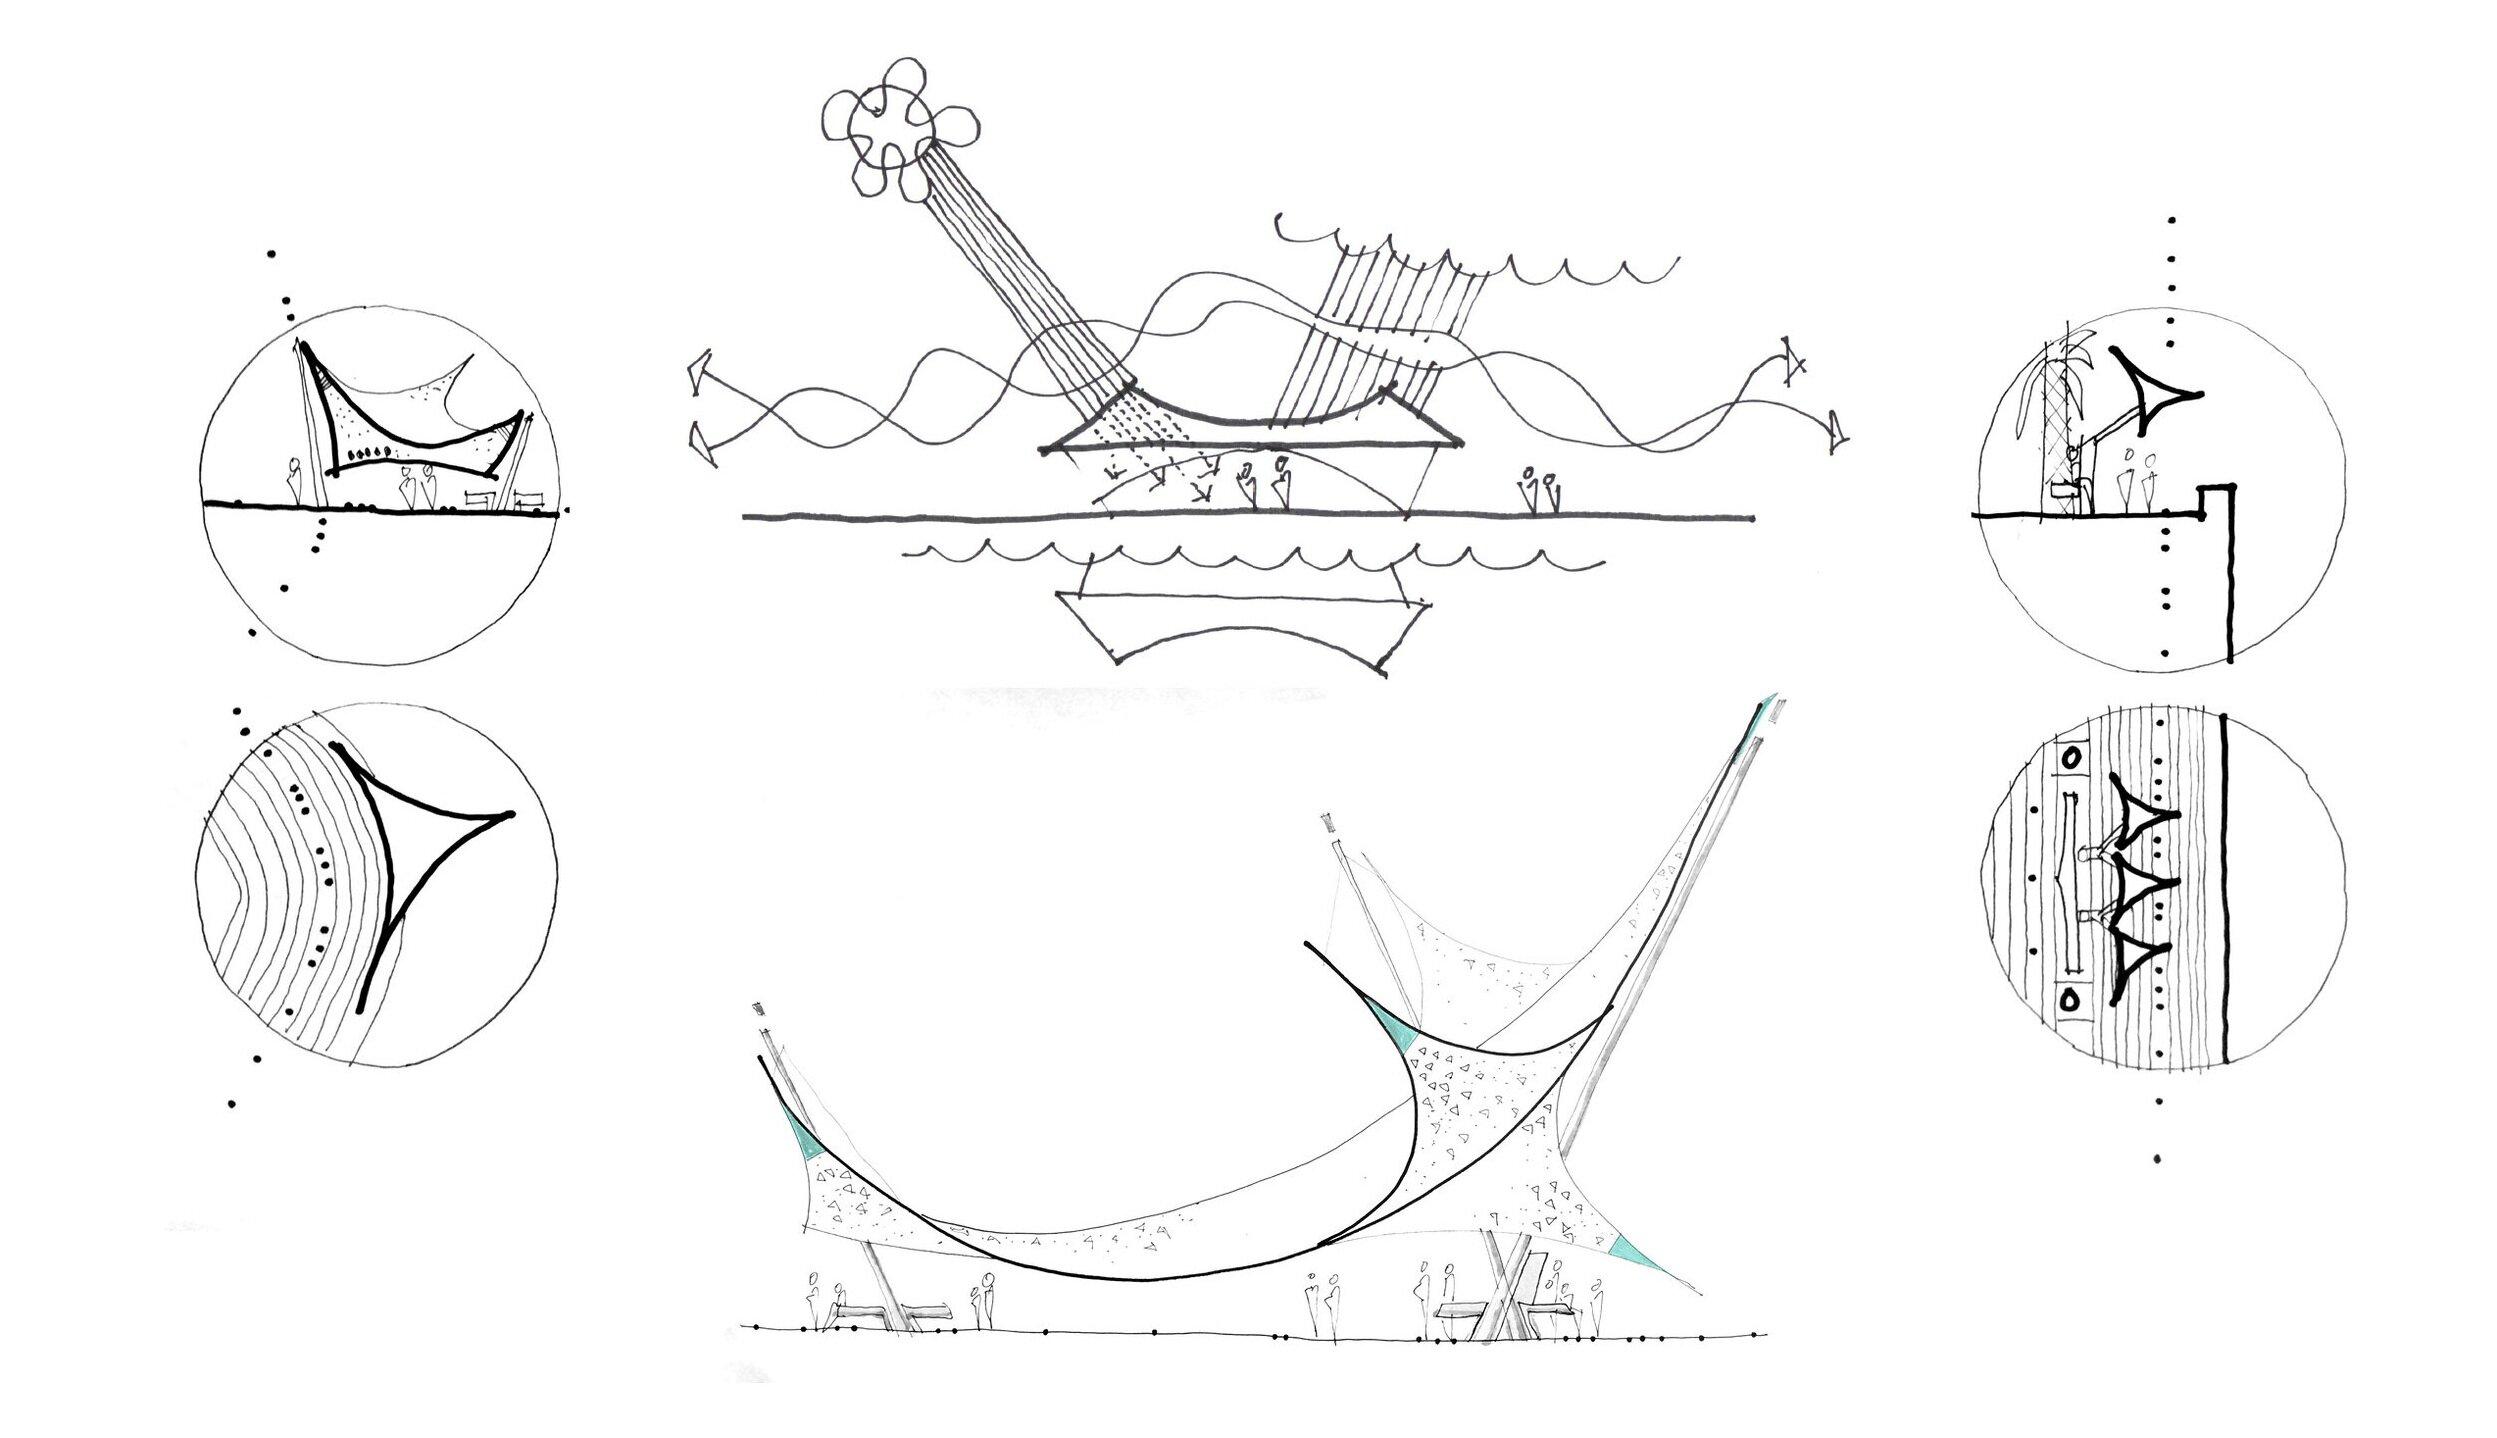 170720 Miami RFP Storyboard Diagrams10.jpg